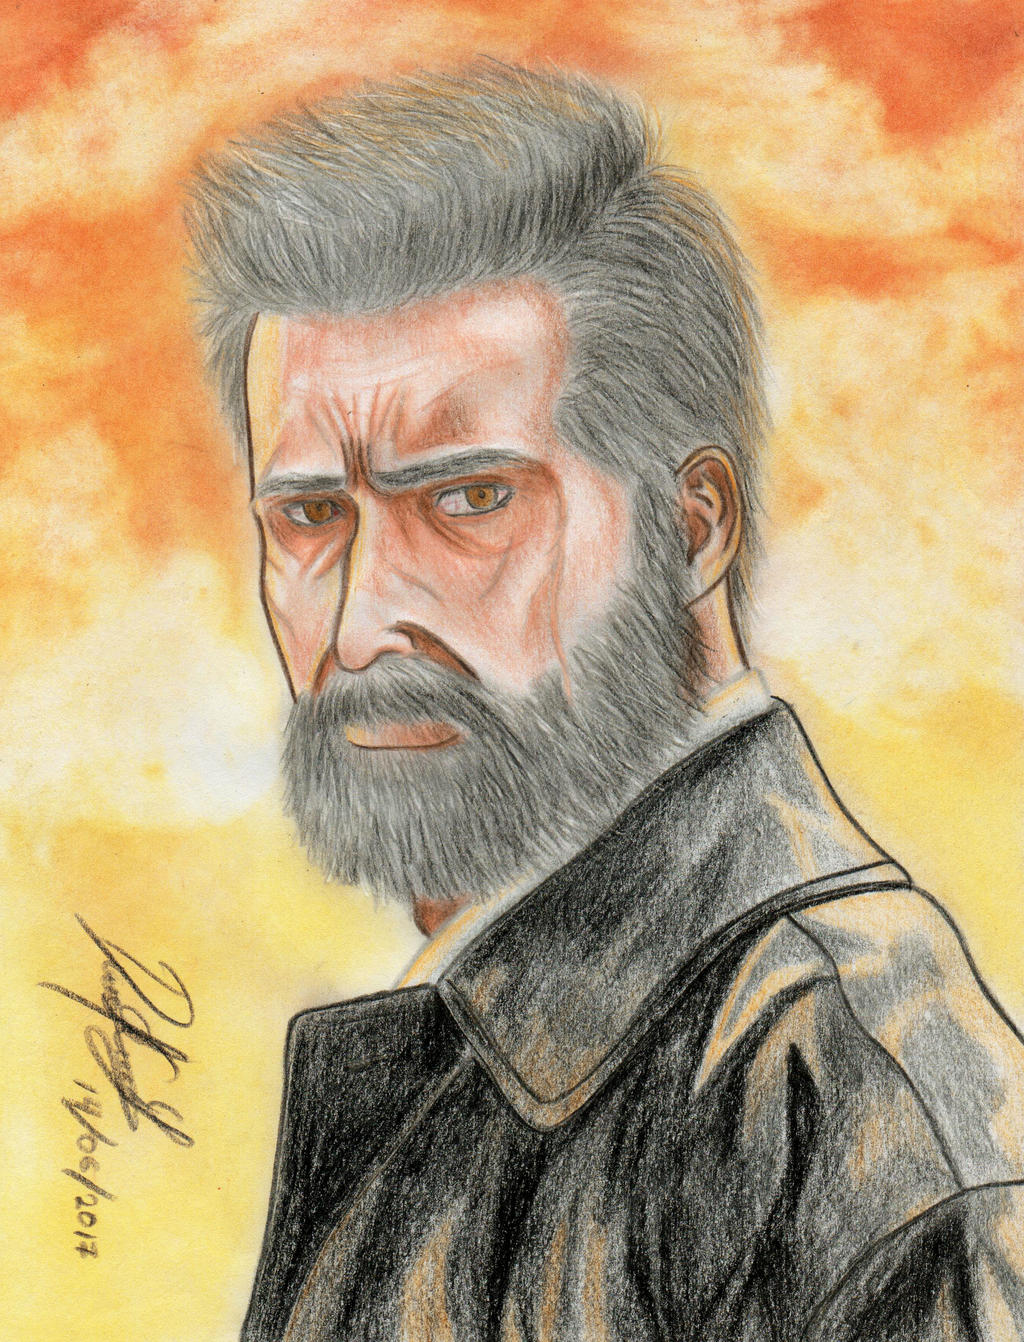 Logan (Movie Version) by danielcamilo